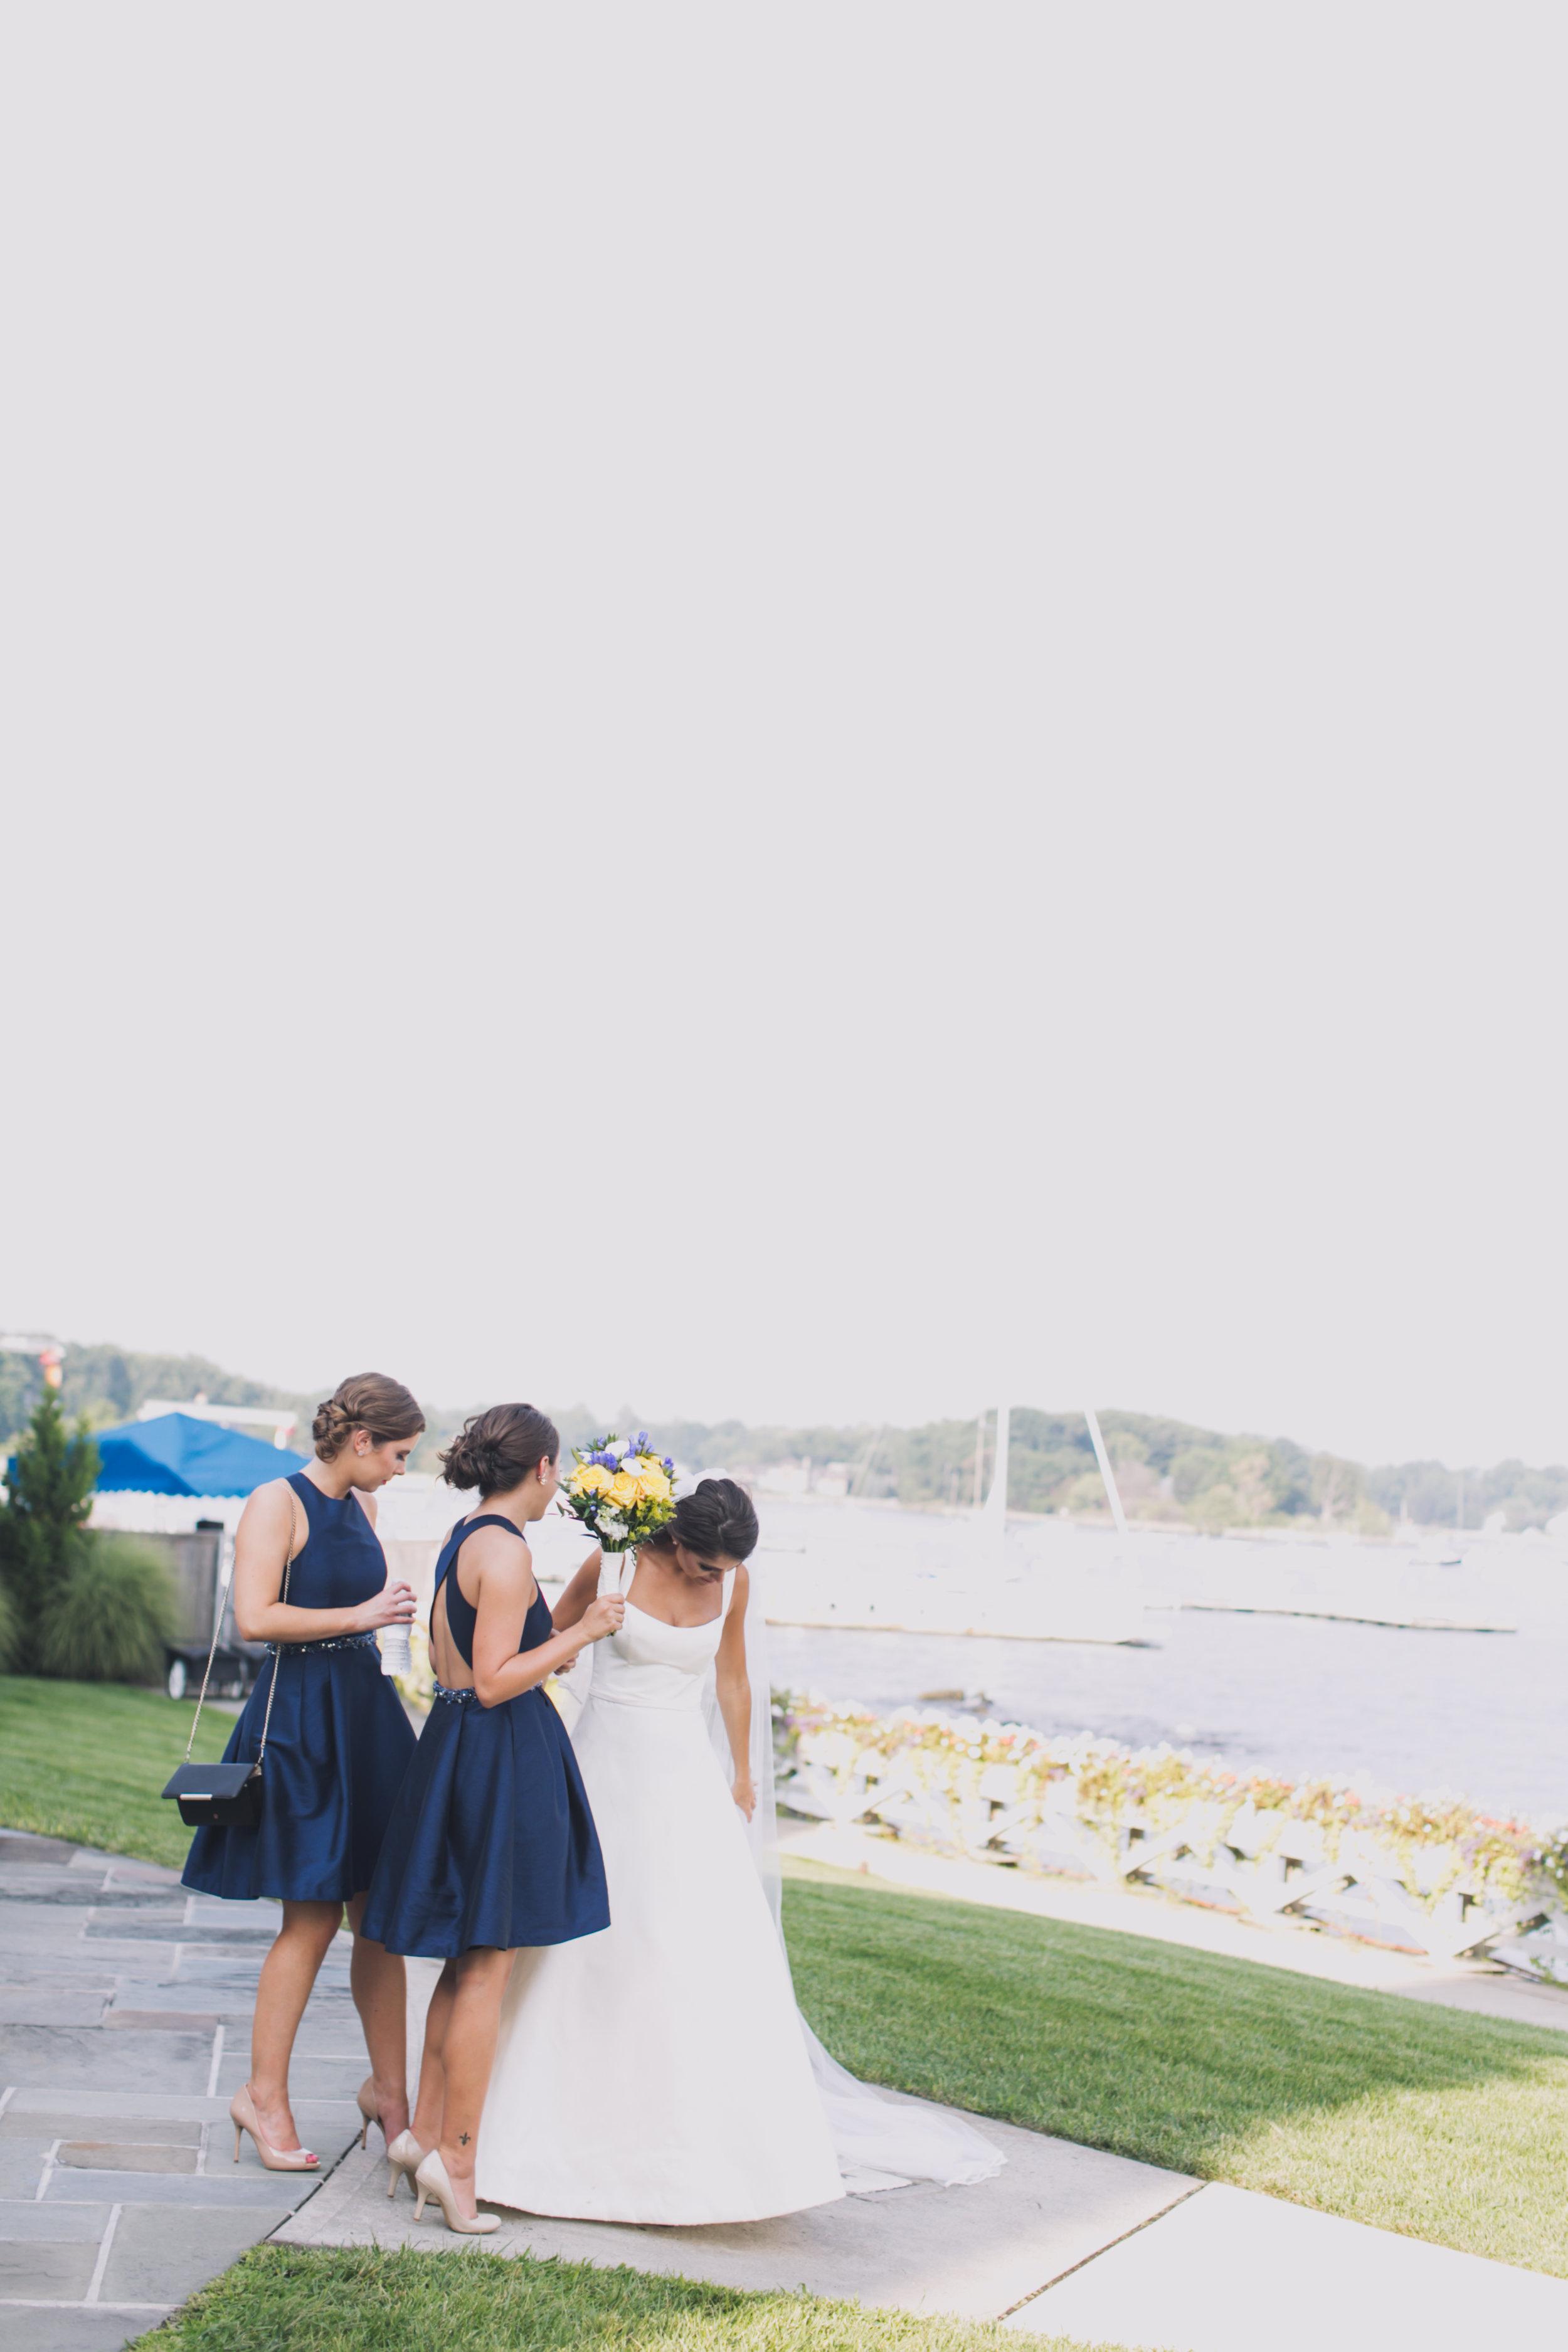 Madeleine_Matt_Wedding_Slideshow_Jpegs-097.jpg